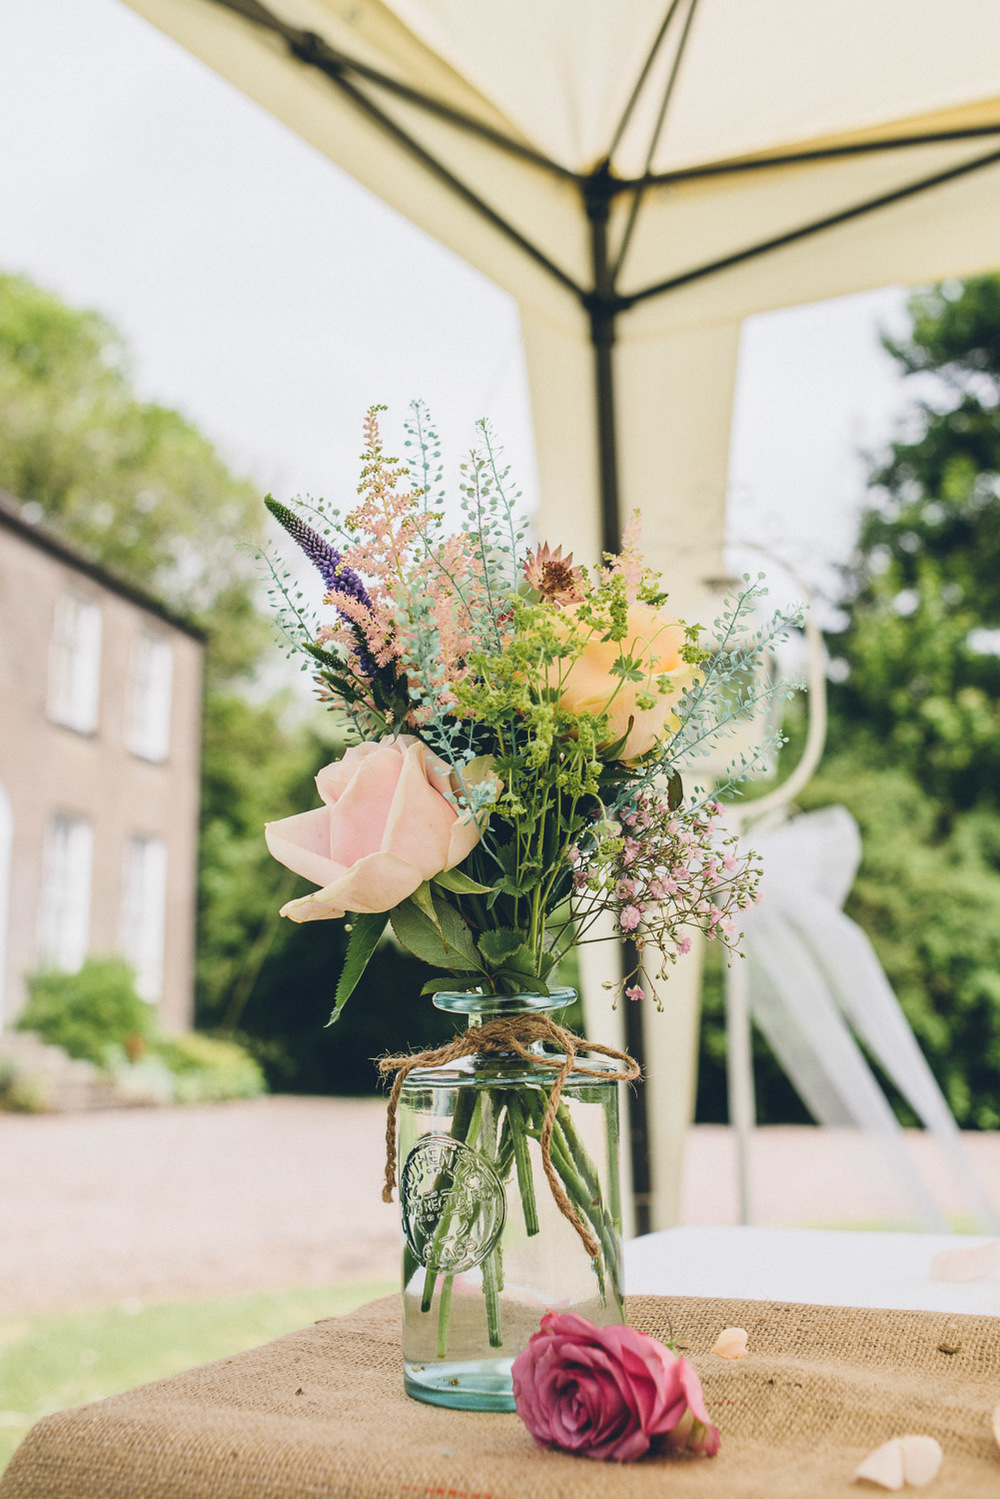 Kelly Mcallister photography Belfast wedding Northern ireland wedding photographer_-6b.jpg